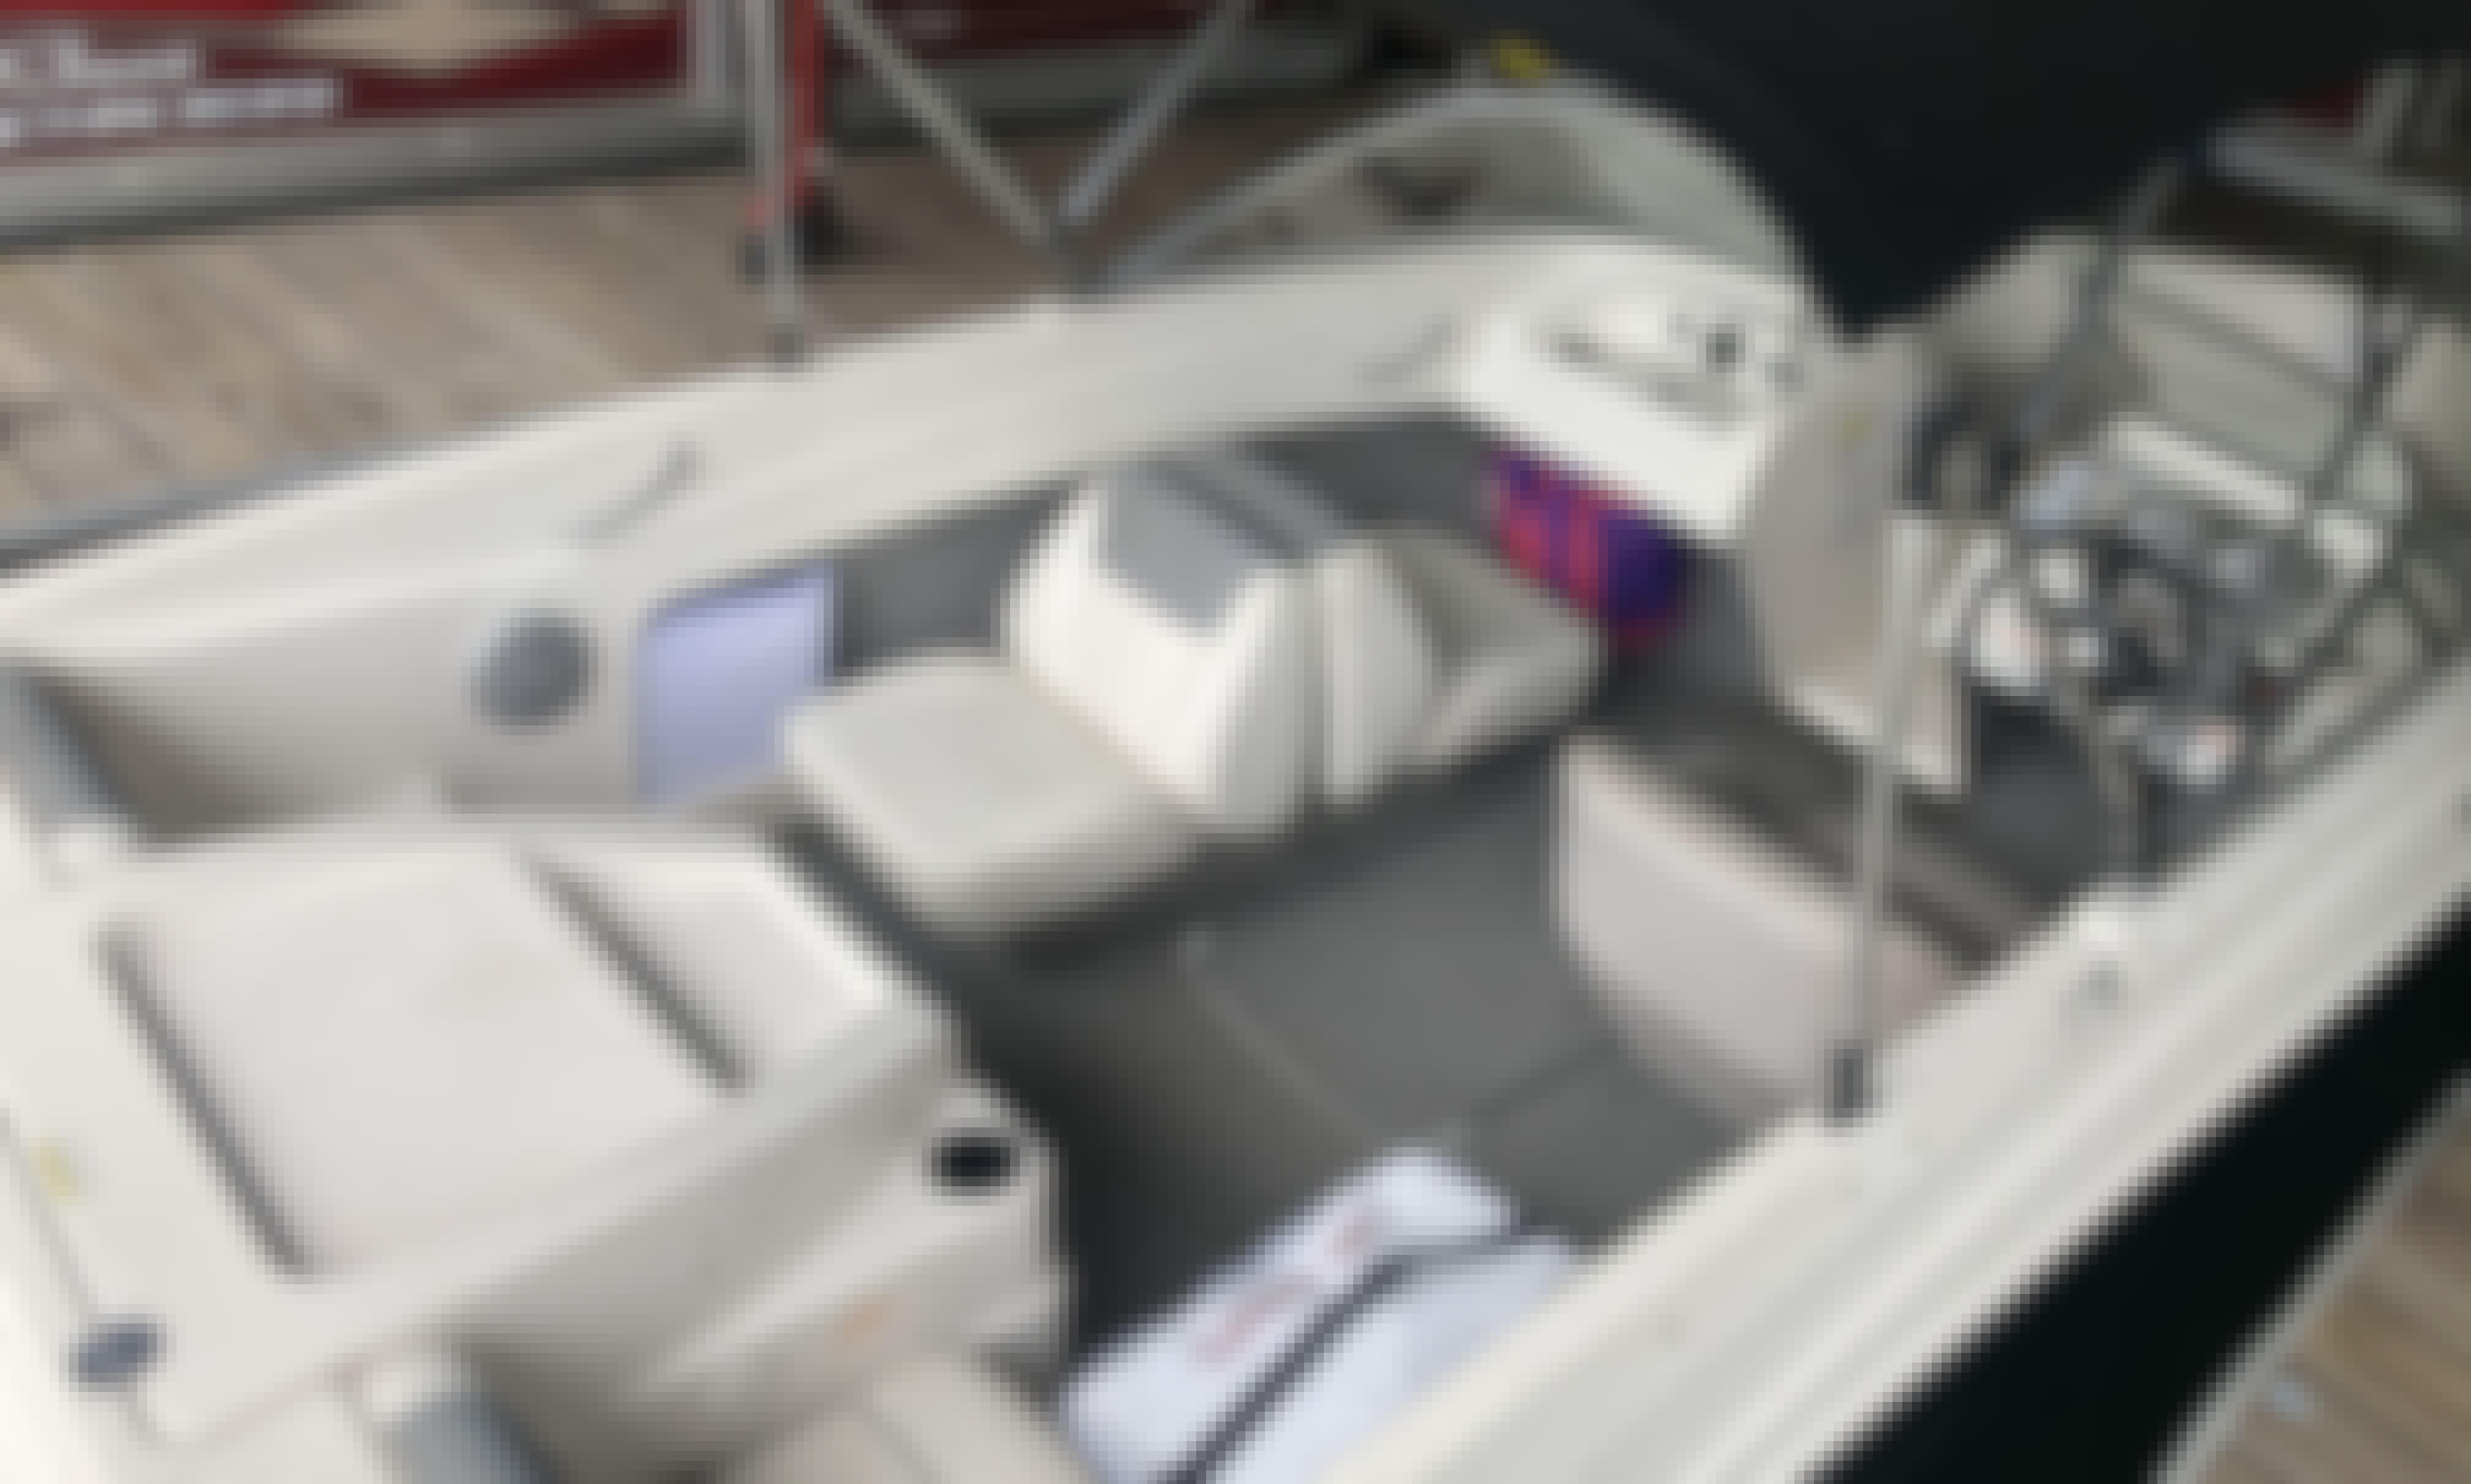 Rent a boat in Acworth Georgia